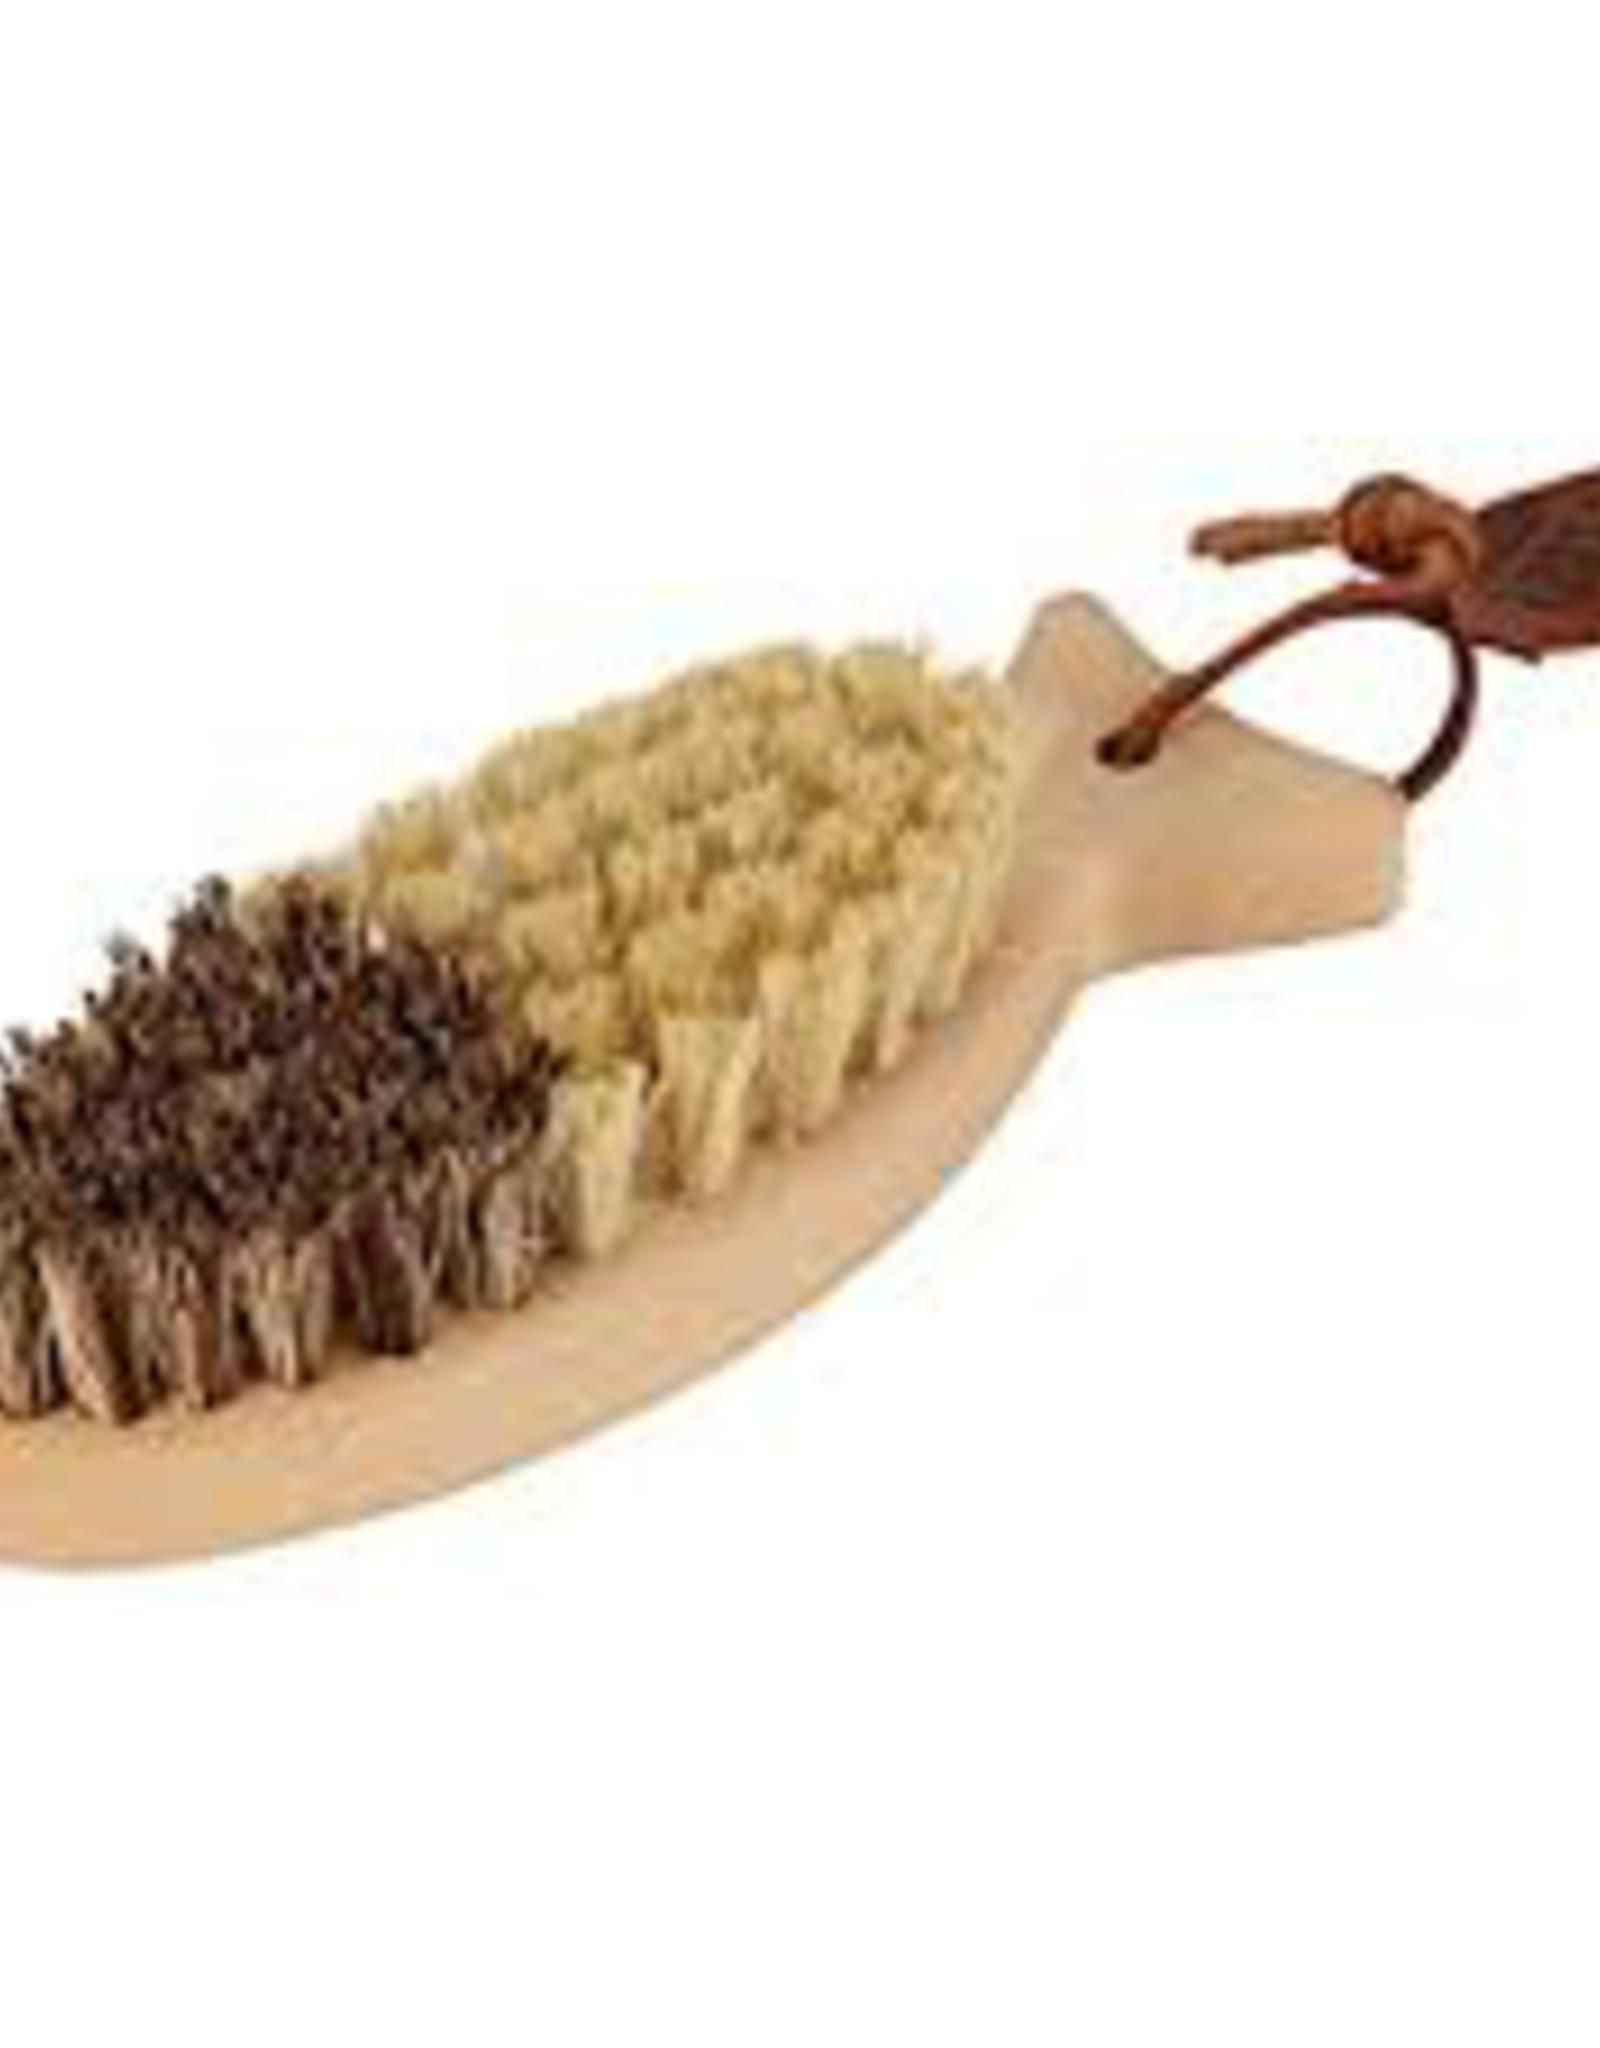 Vegetable Brush-Fish